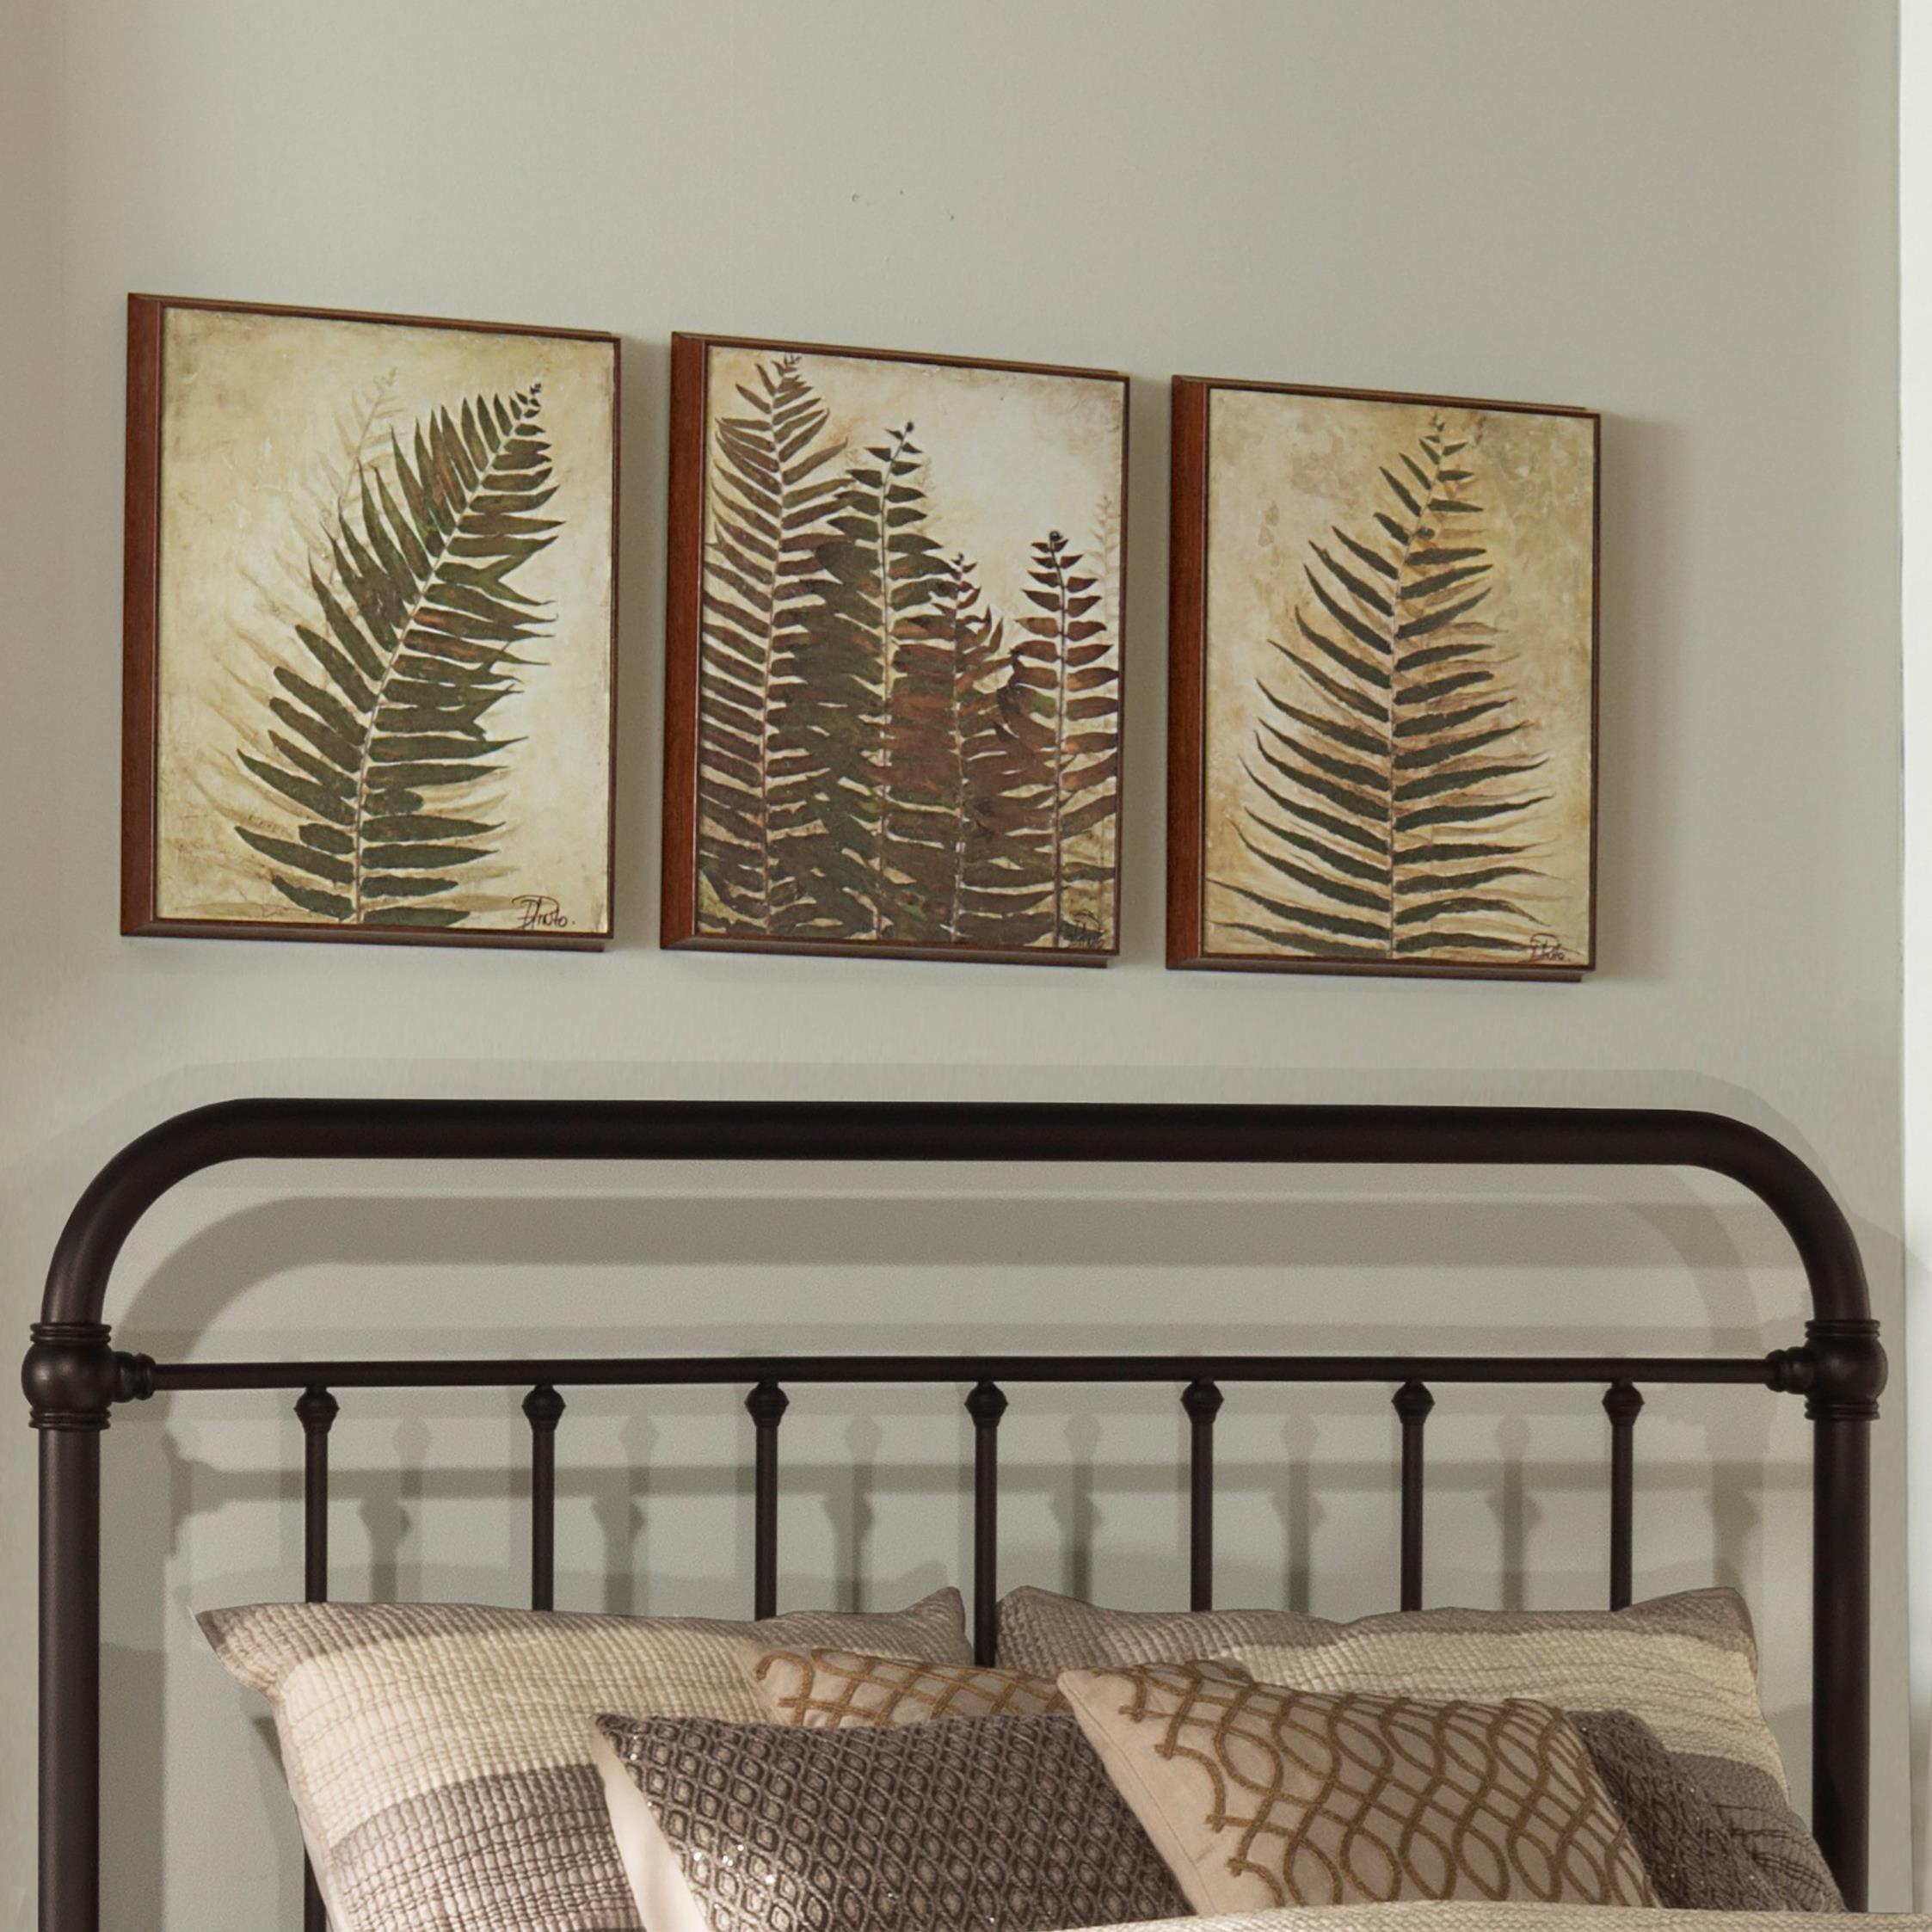 Metal Beds Full/Queen Metal Headboard by Hillsdale at Mueller Furniture